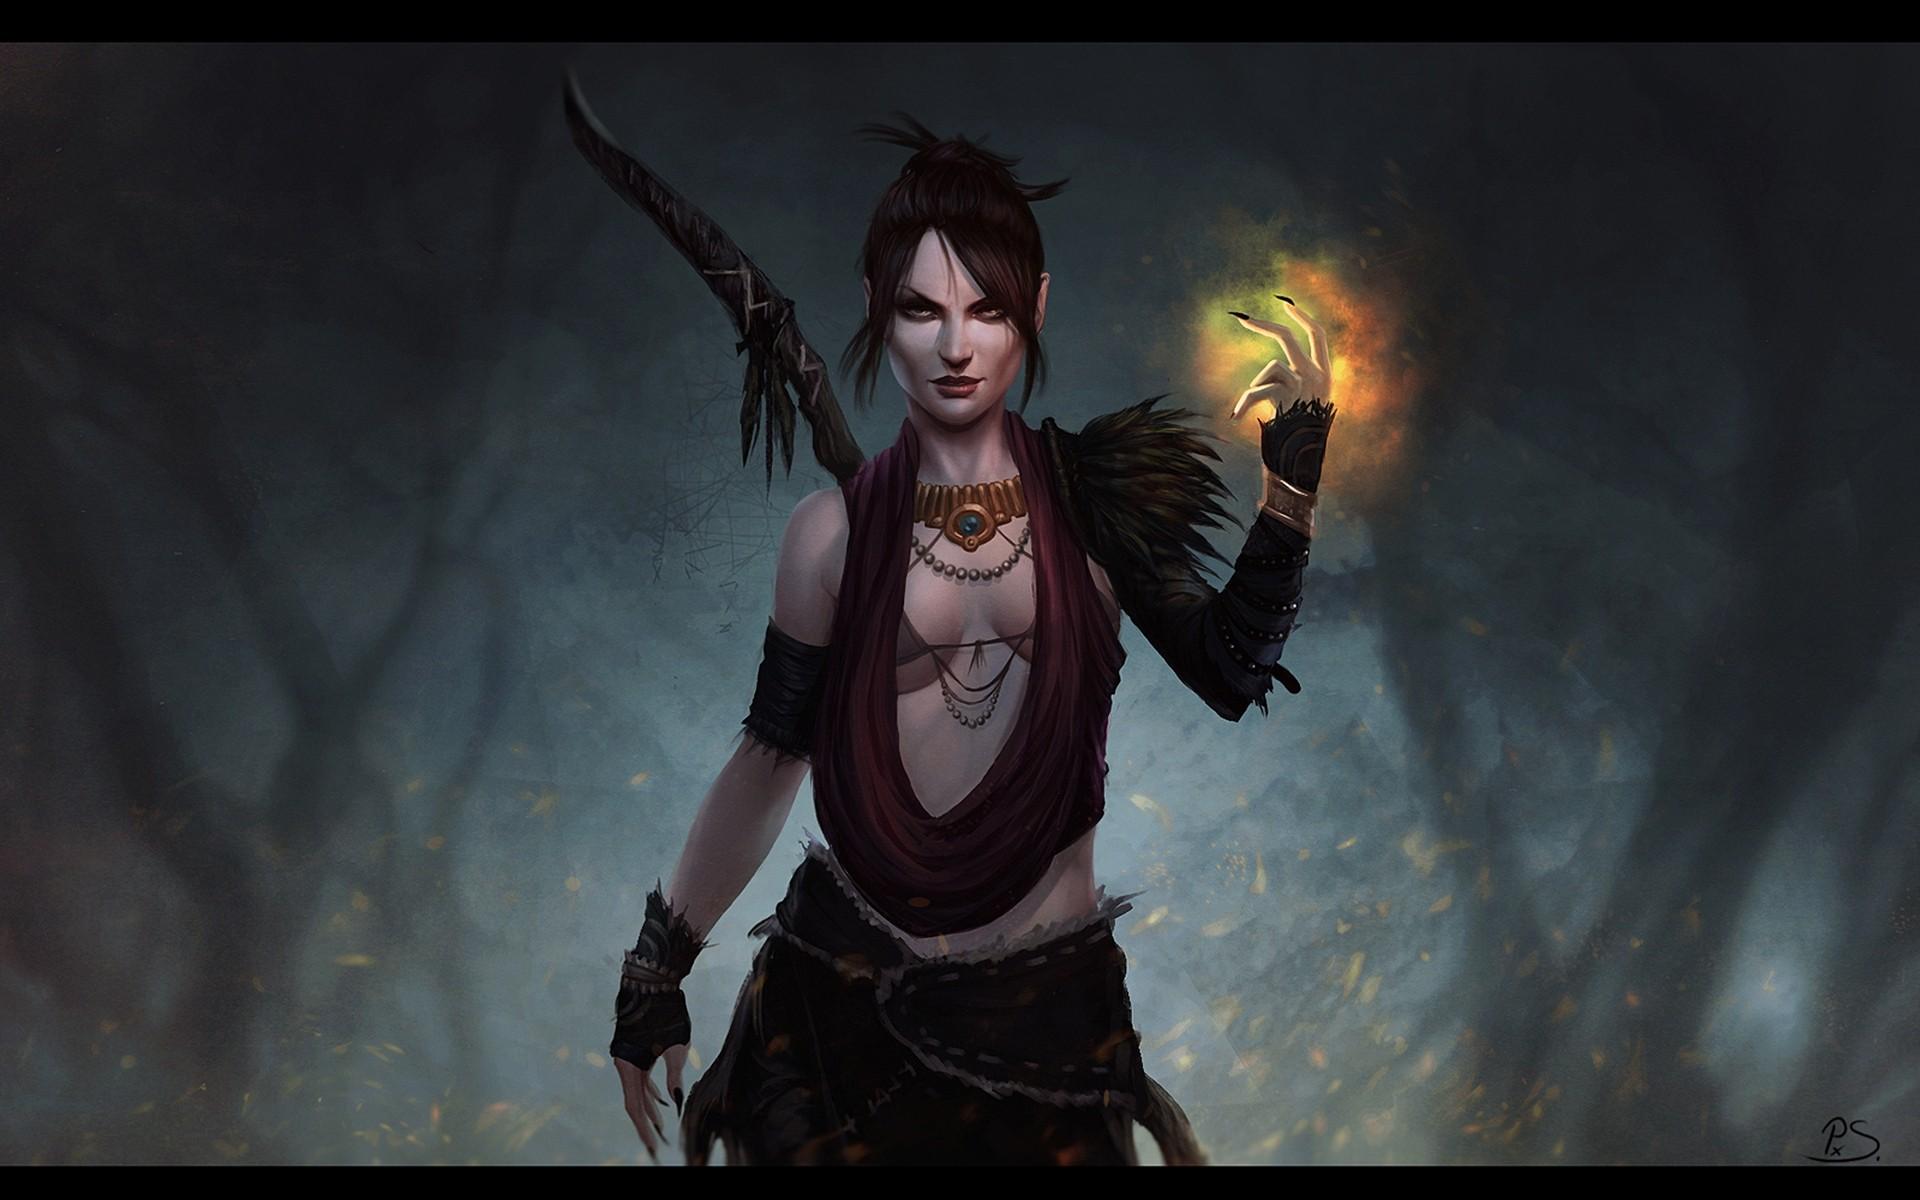 Файлы Dragon Age: Origins - патч, демо, demo, моды